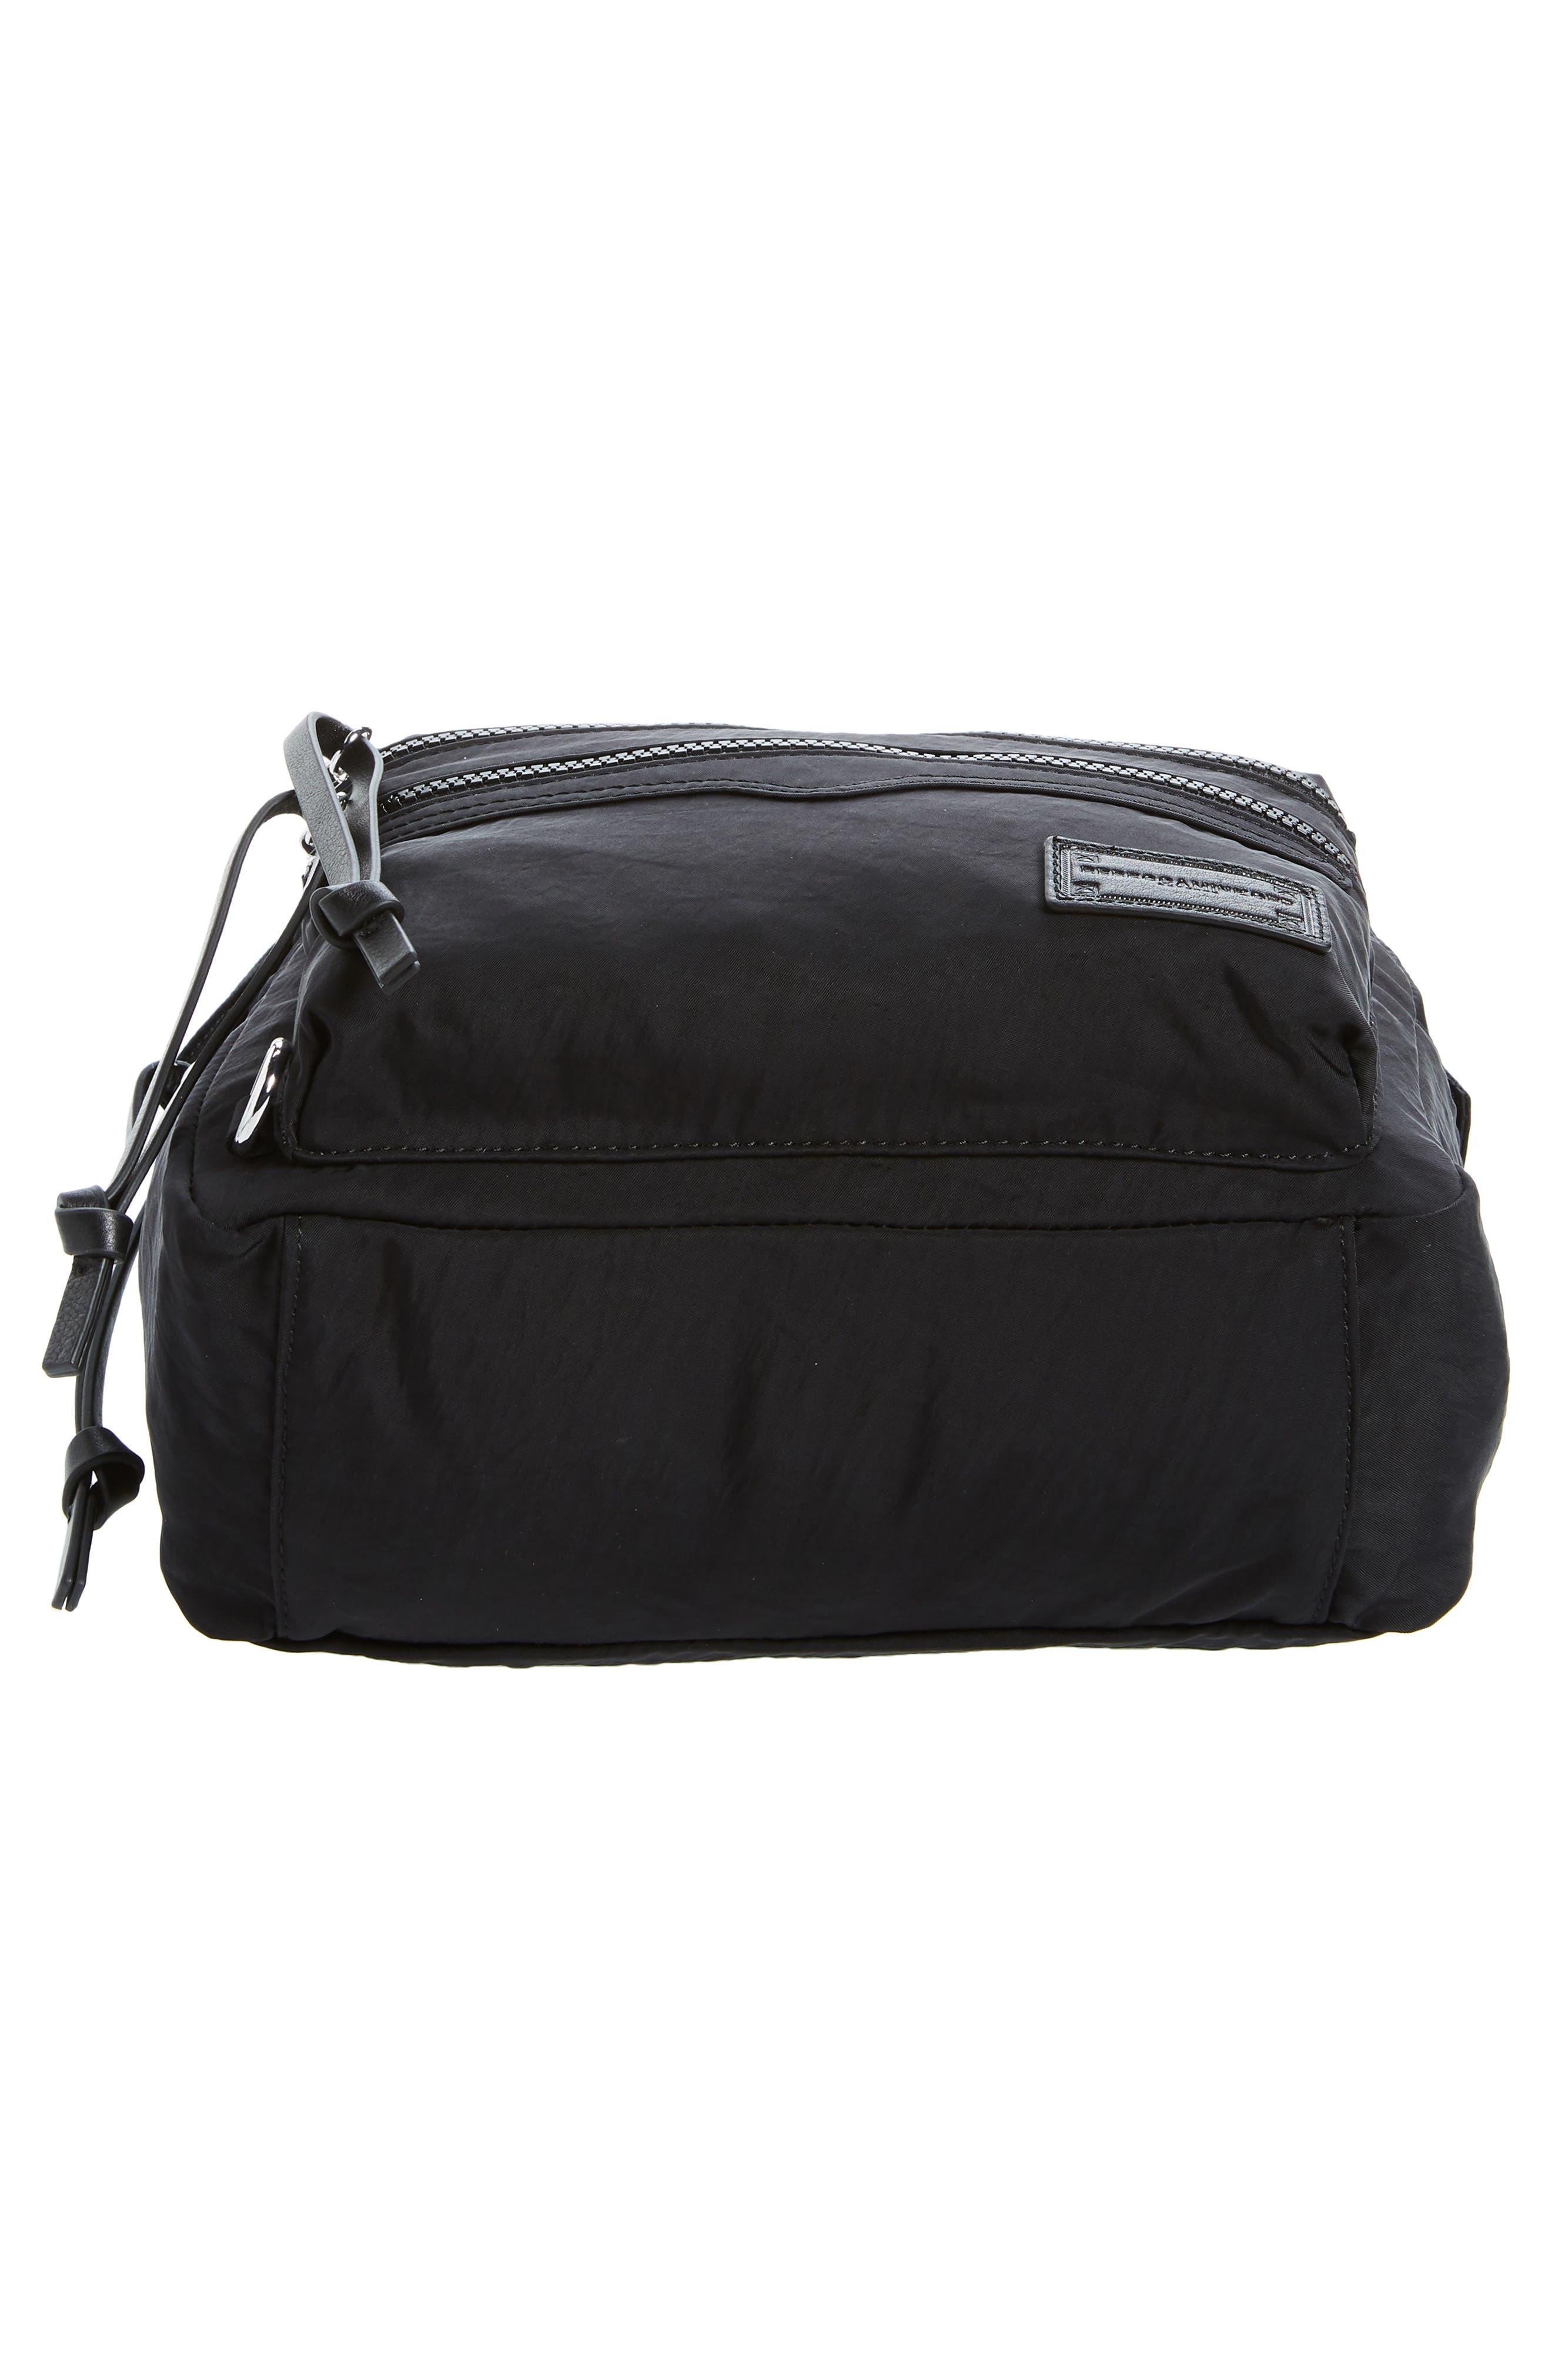 REBECCA MINKOFF, Nylon Backpack, Alternate thumbnail 7, color, BLACK